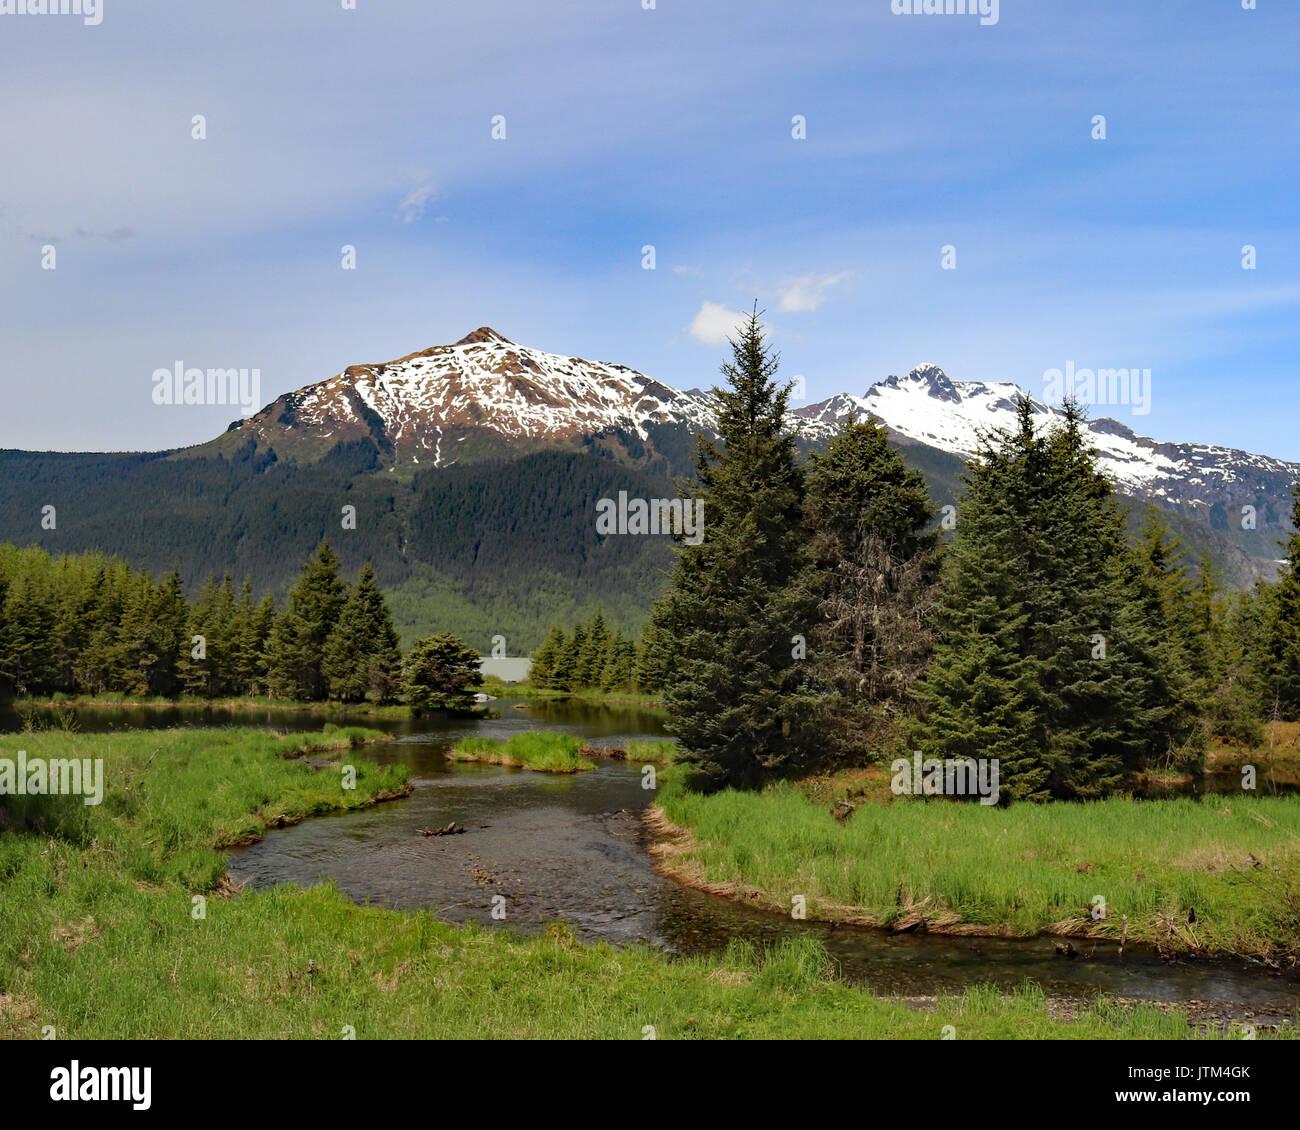 Mendenhall Valley, Juneau Alaska - Stock Image